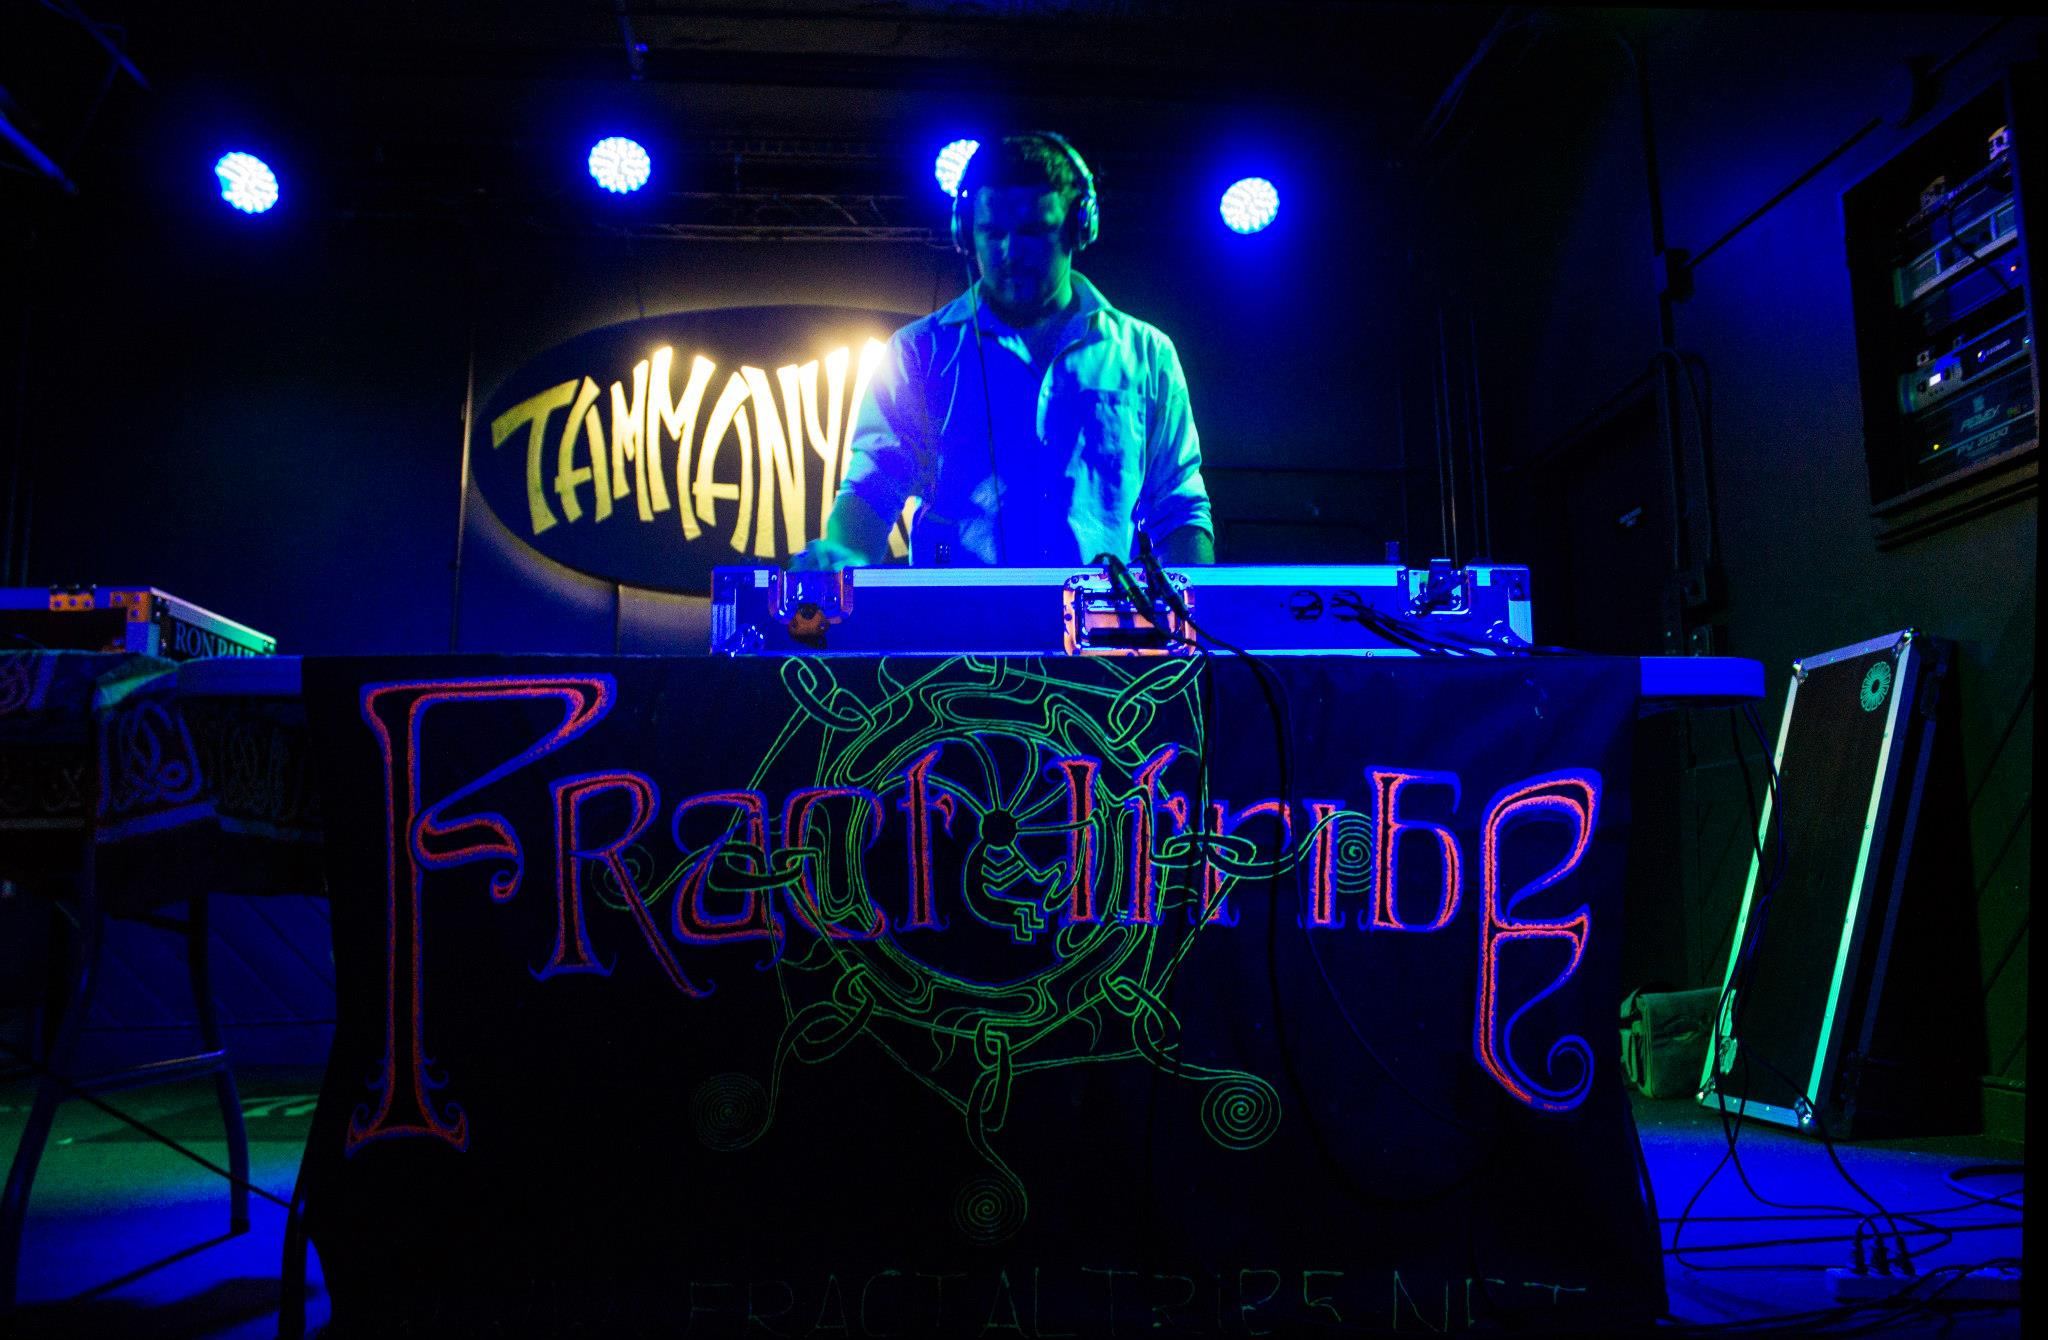 Rob Fractaltribe Tammany hall 2013.jpg